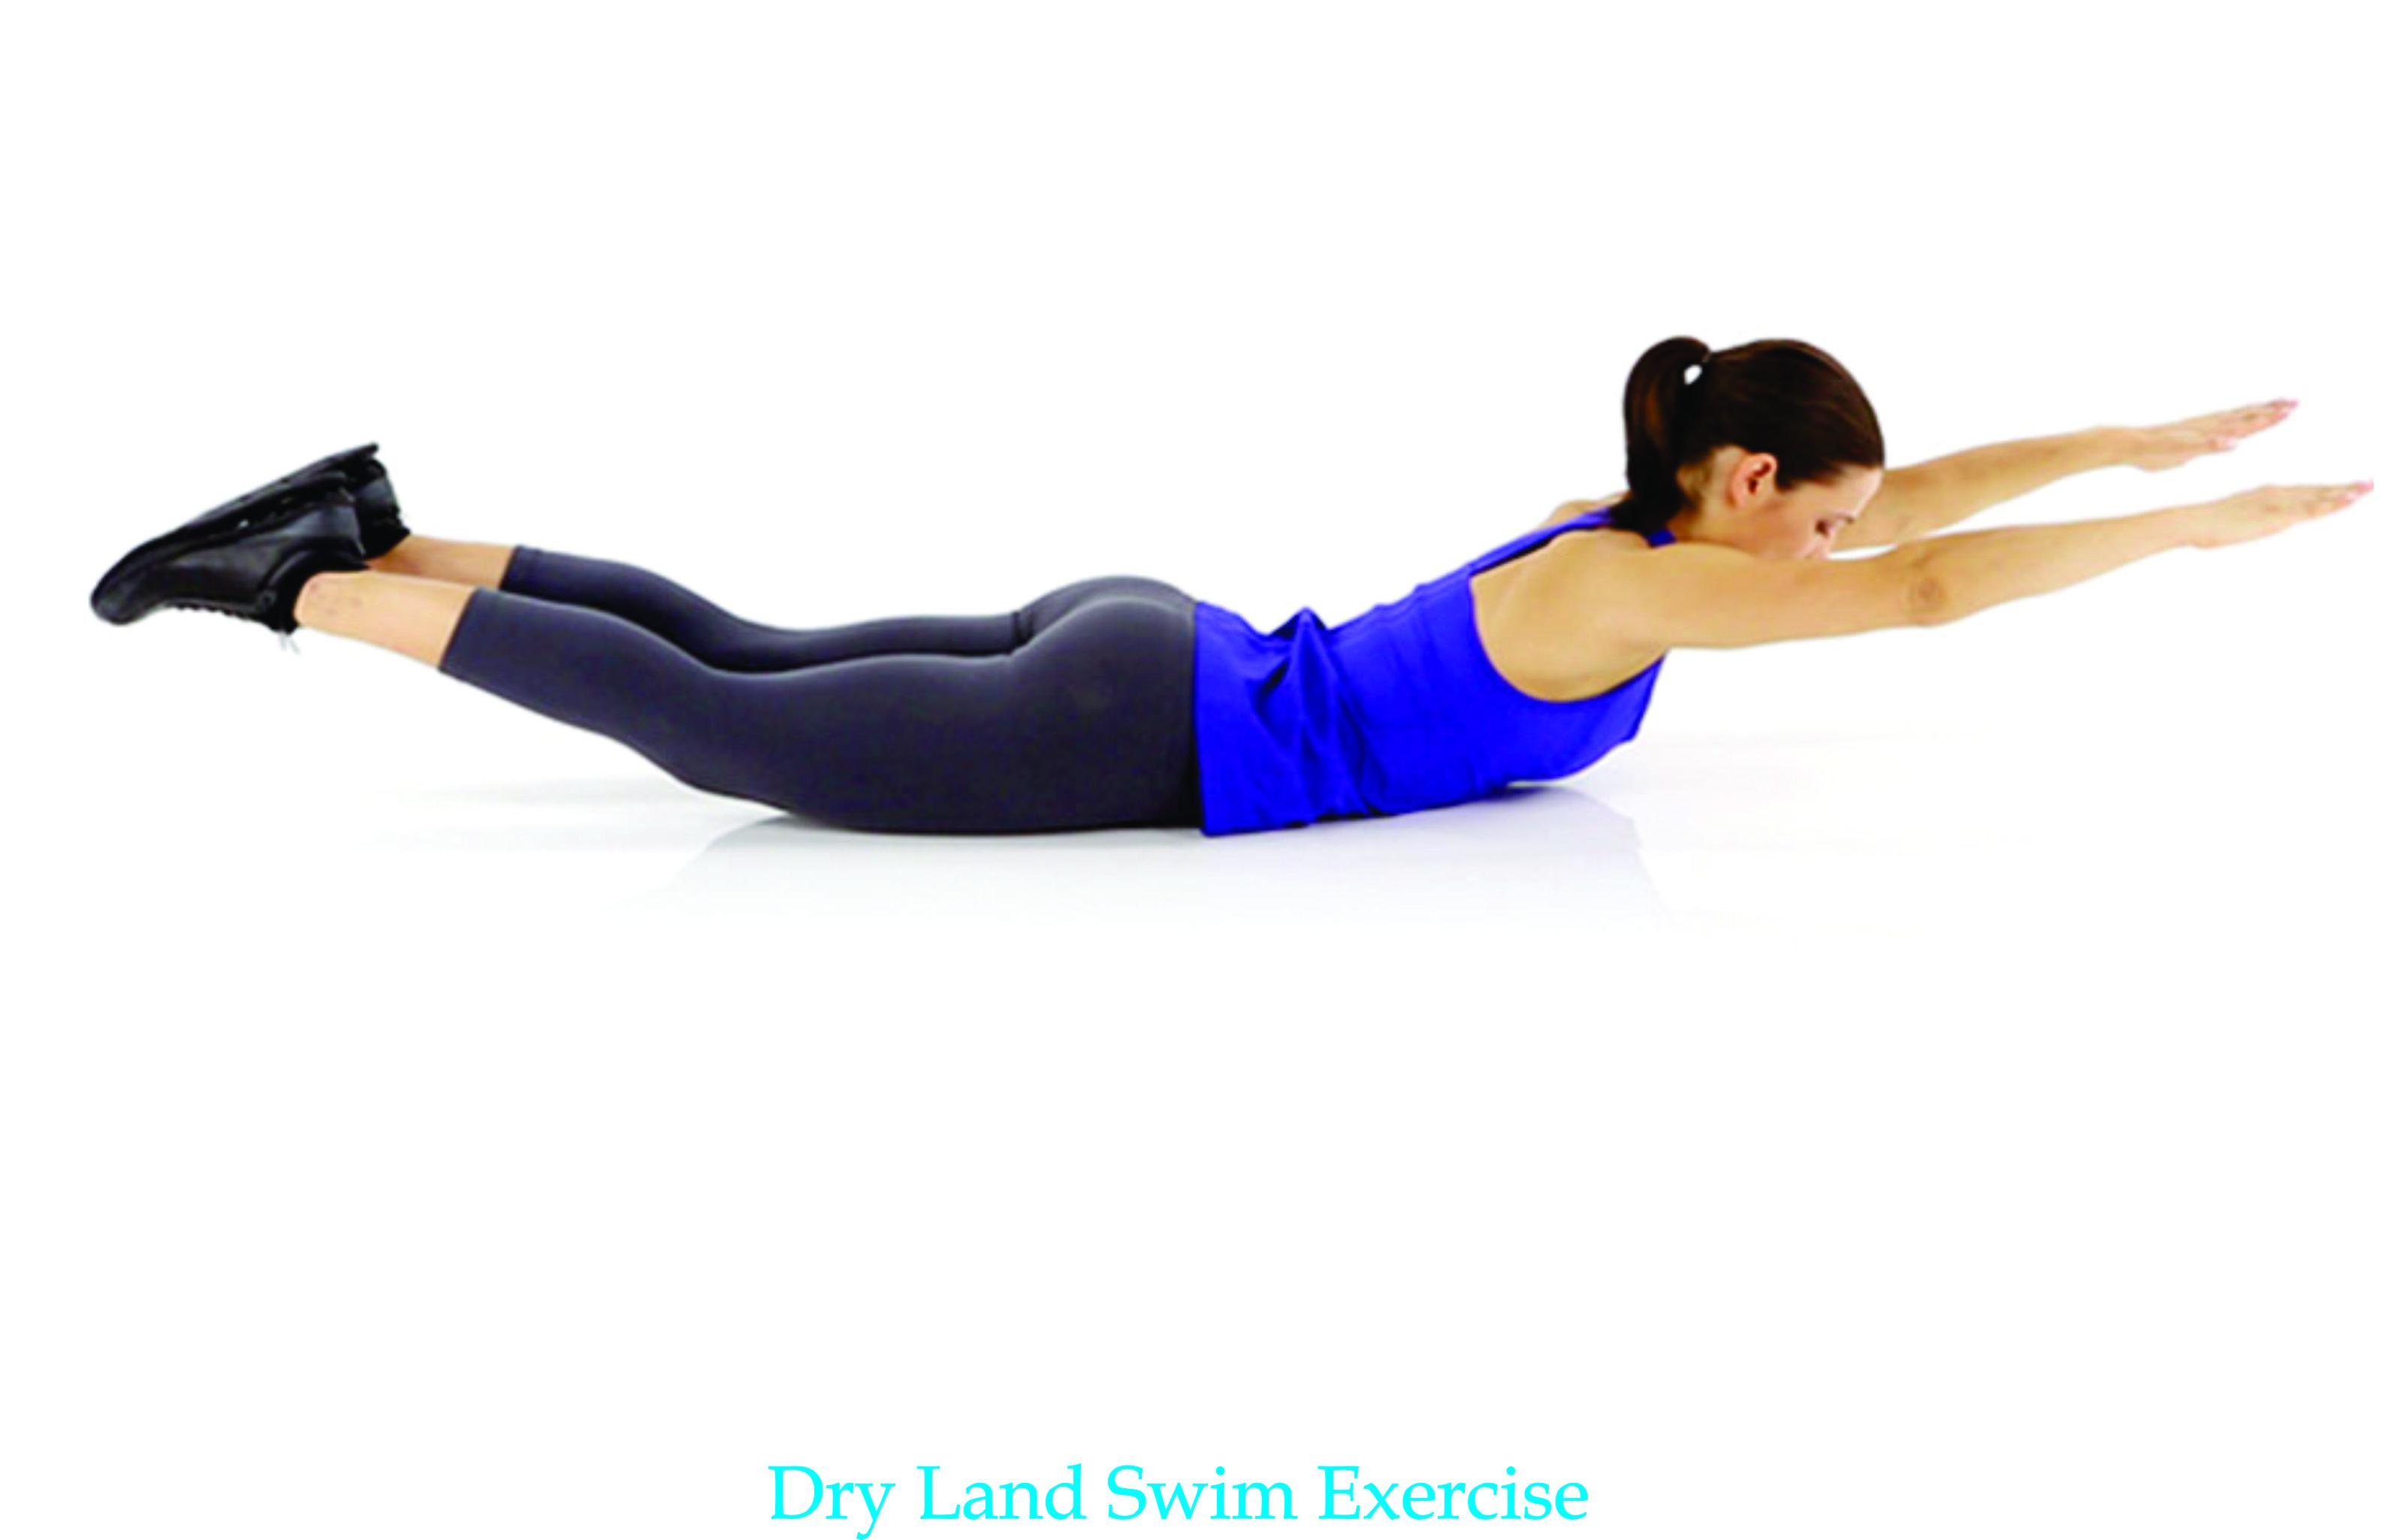 dry land swim exercise